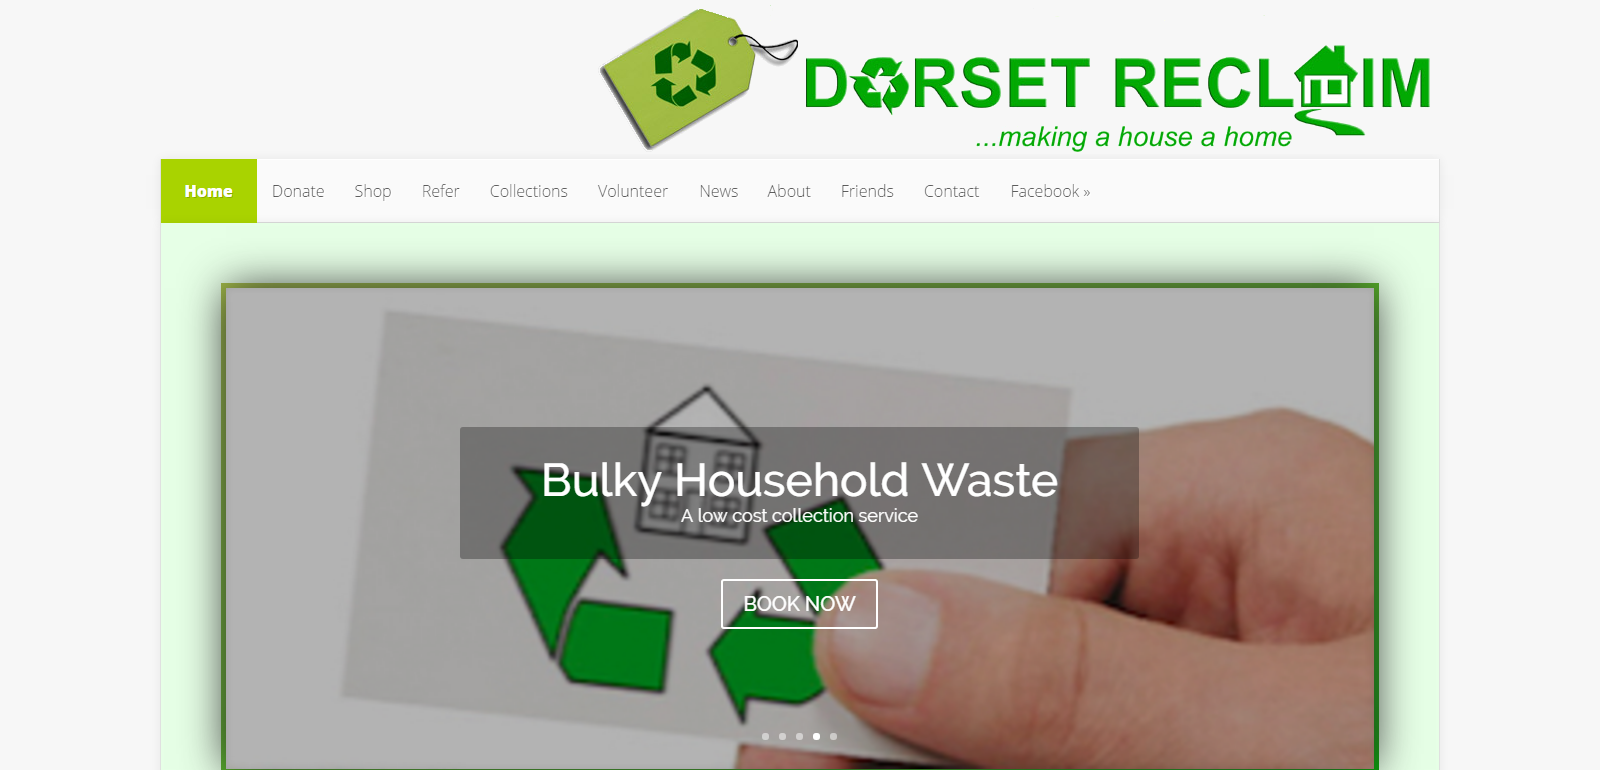 Dorset Reclaim Website